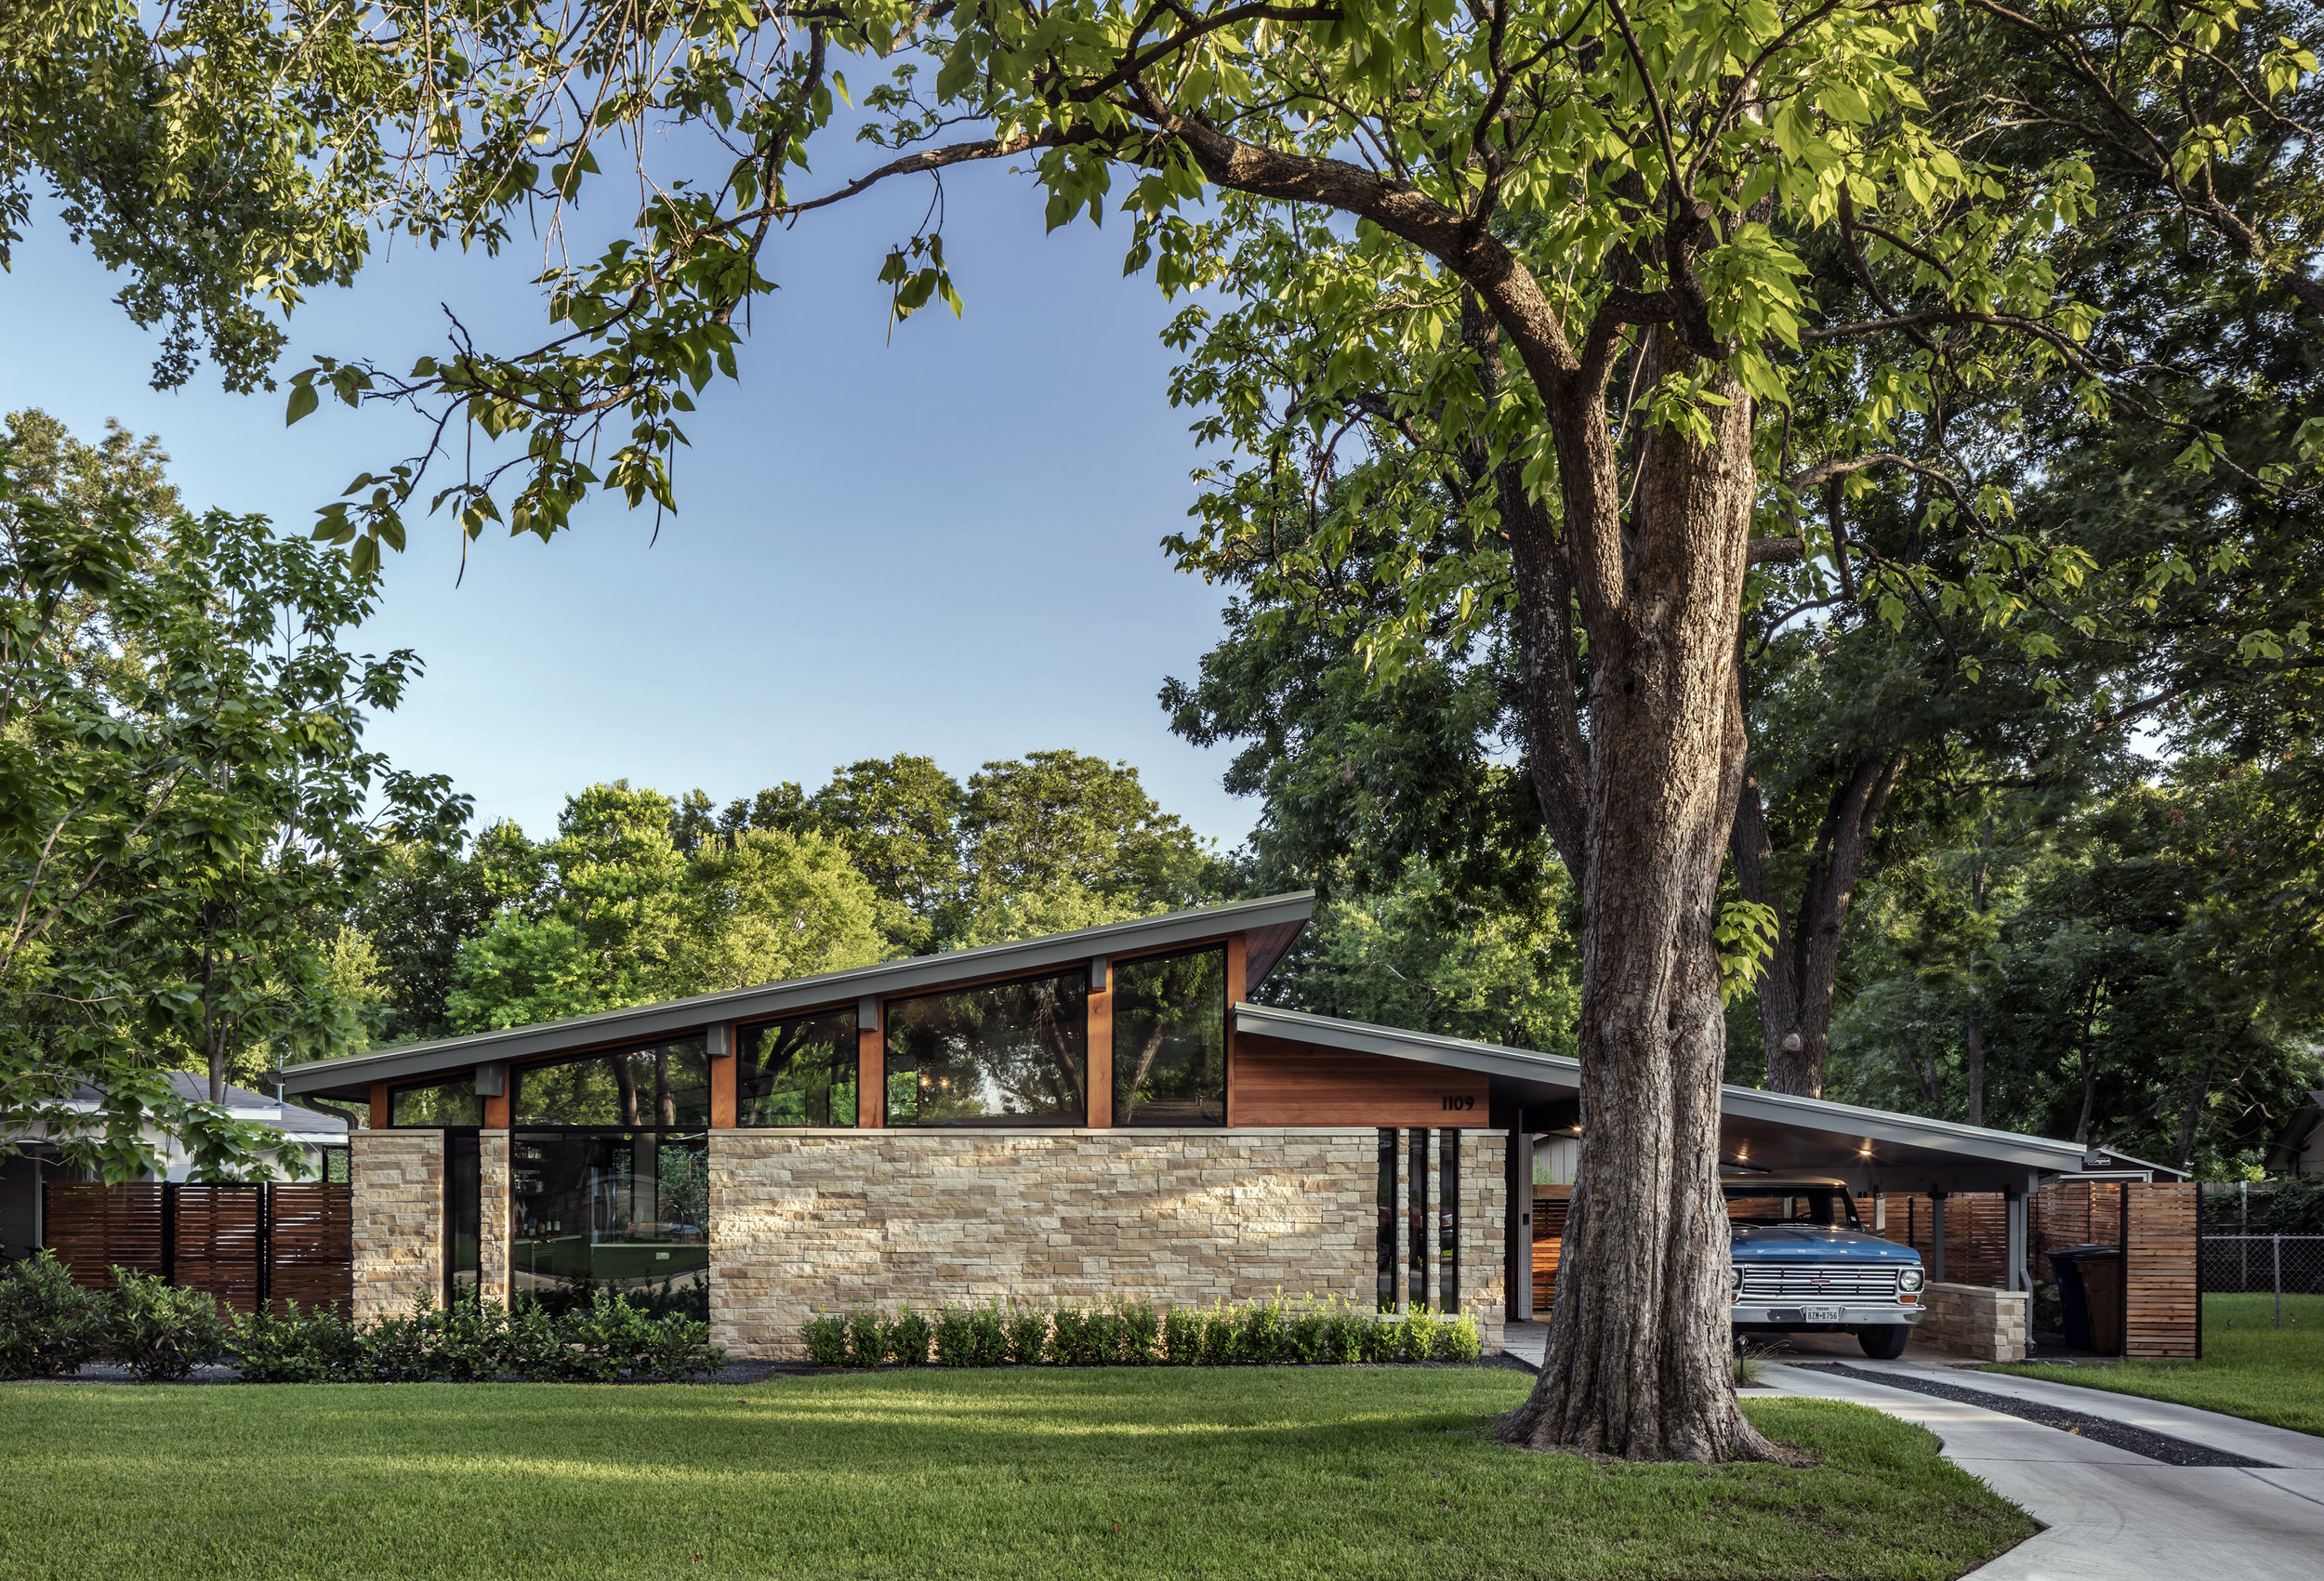 03 Re-Open House by Matt Fajkus Architecture - Photo by Charles Davis Smith.jpg